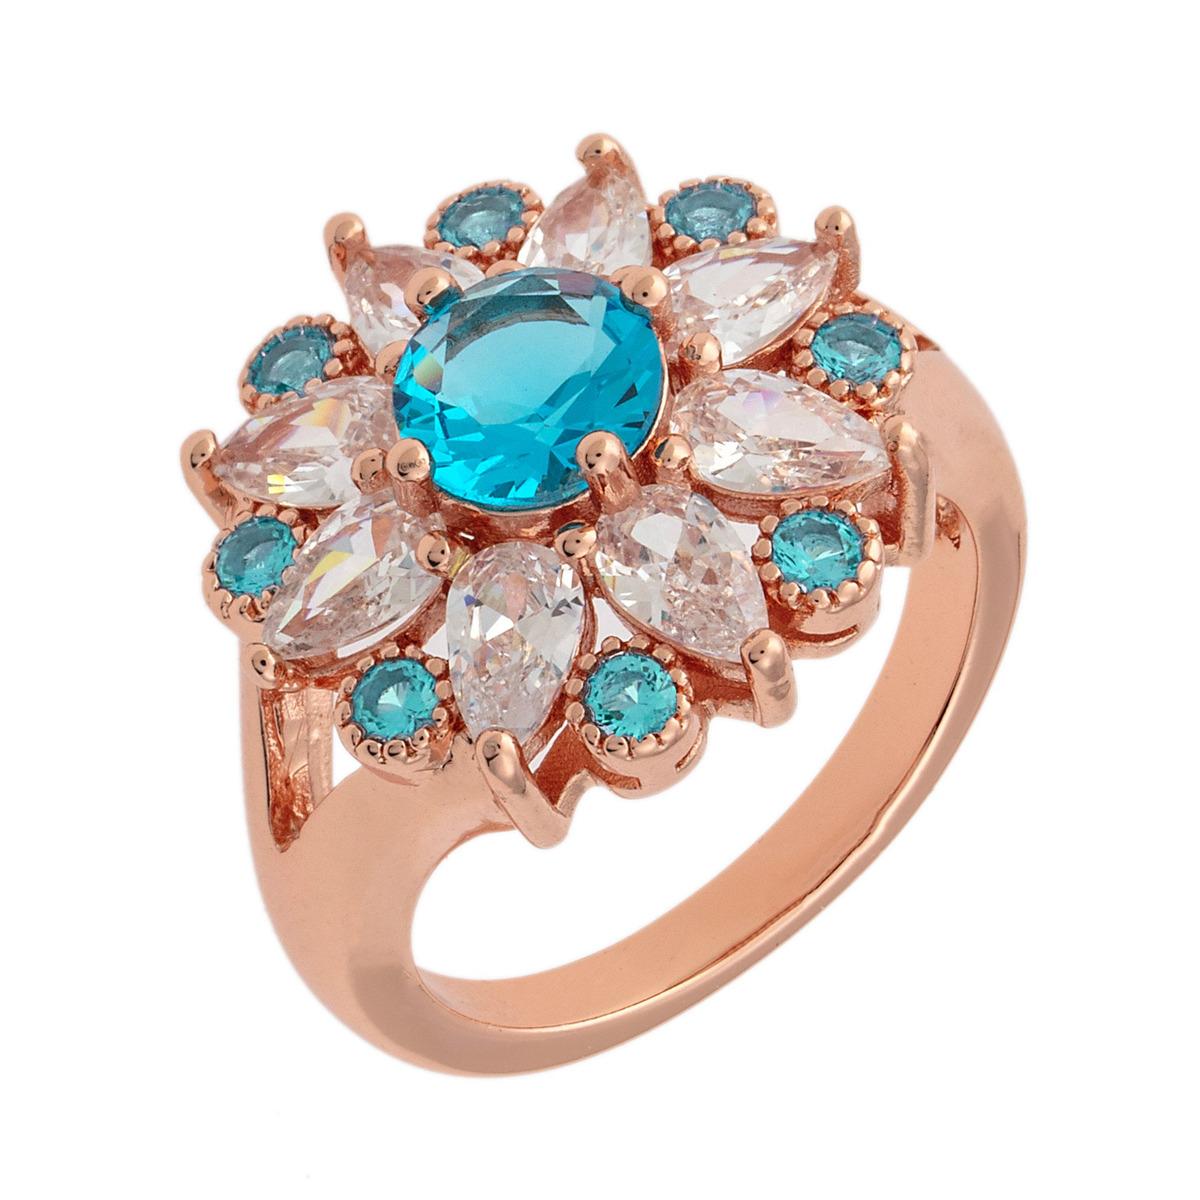 5f94b9f1400e anillo bertha juliet chapado en oro rojo 18k p mujer talla 7. Cargando zoom.